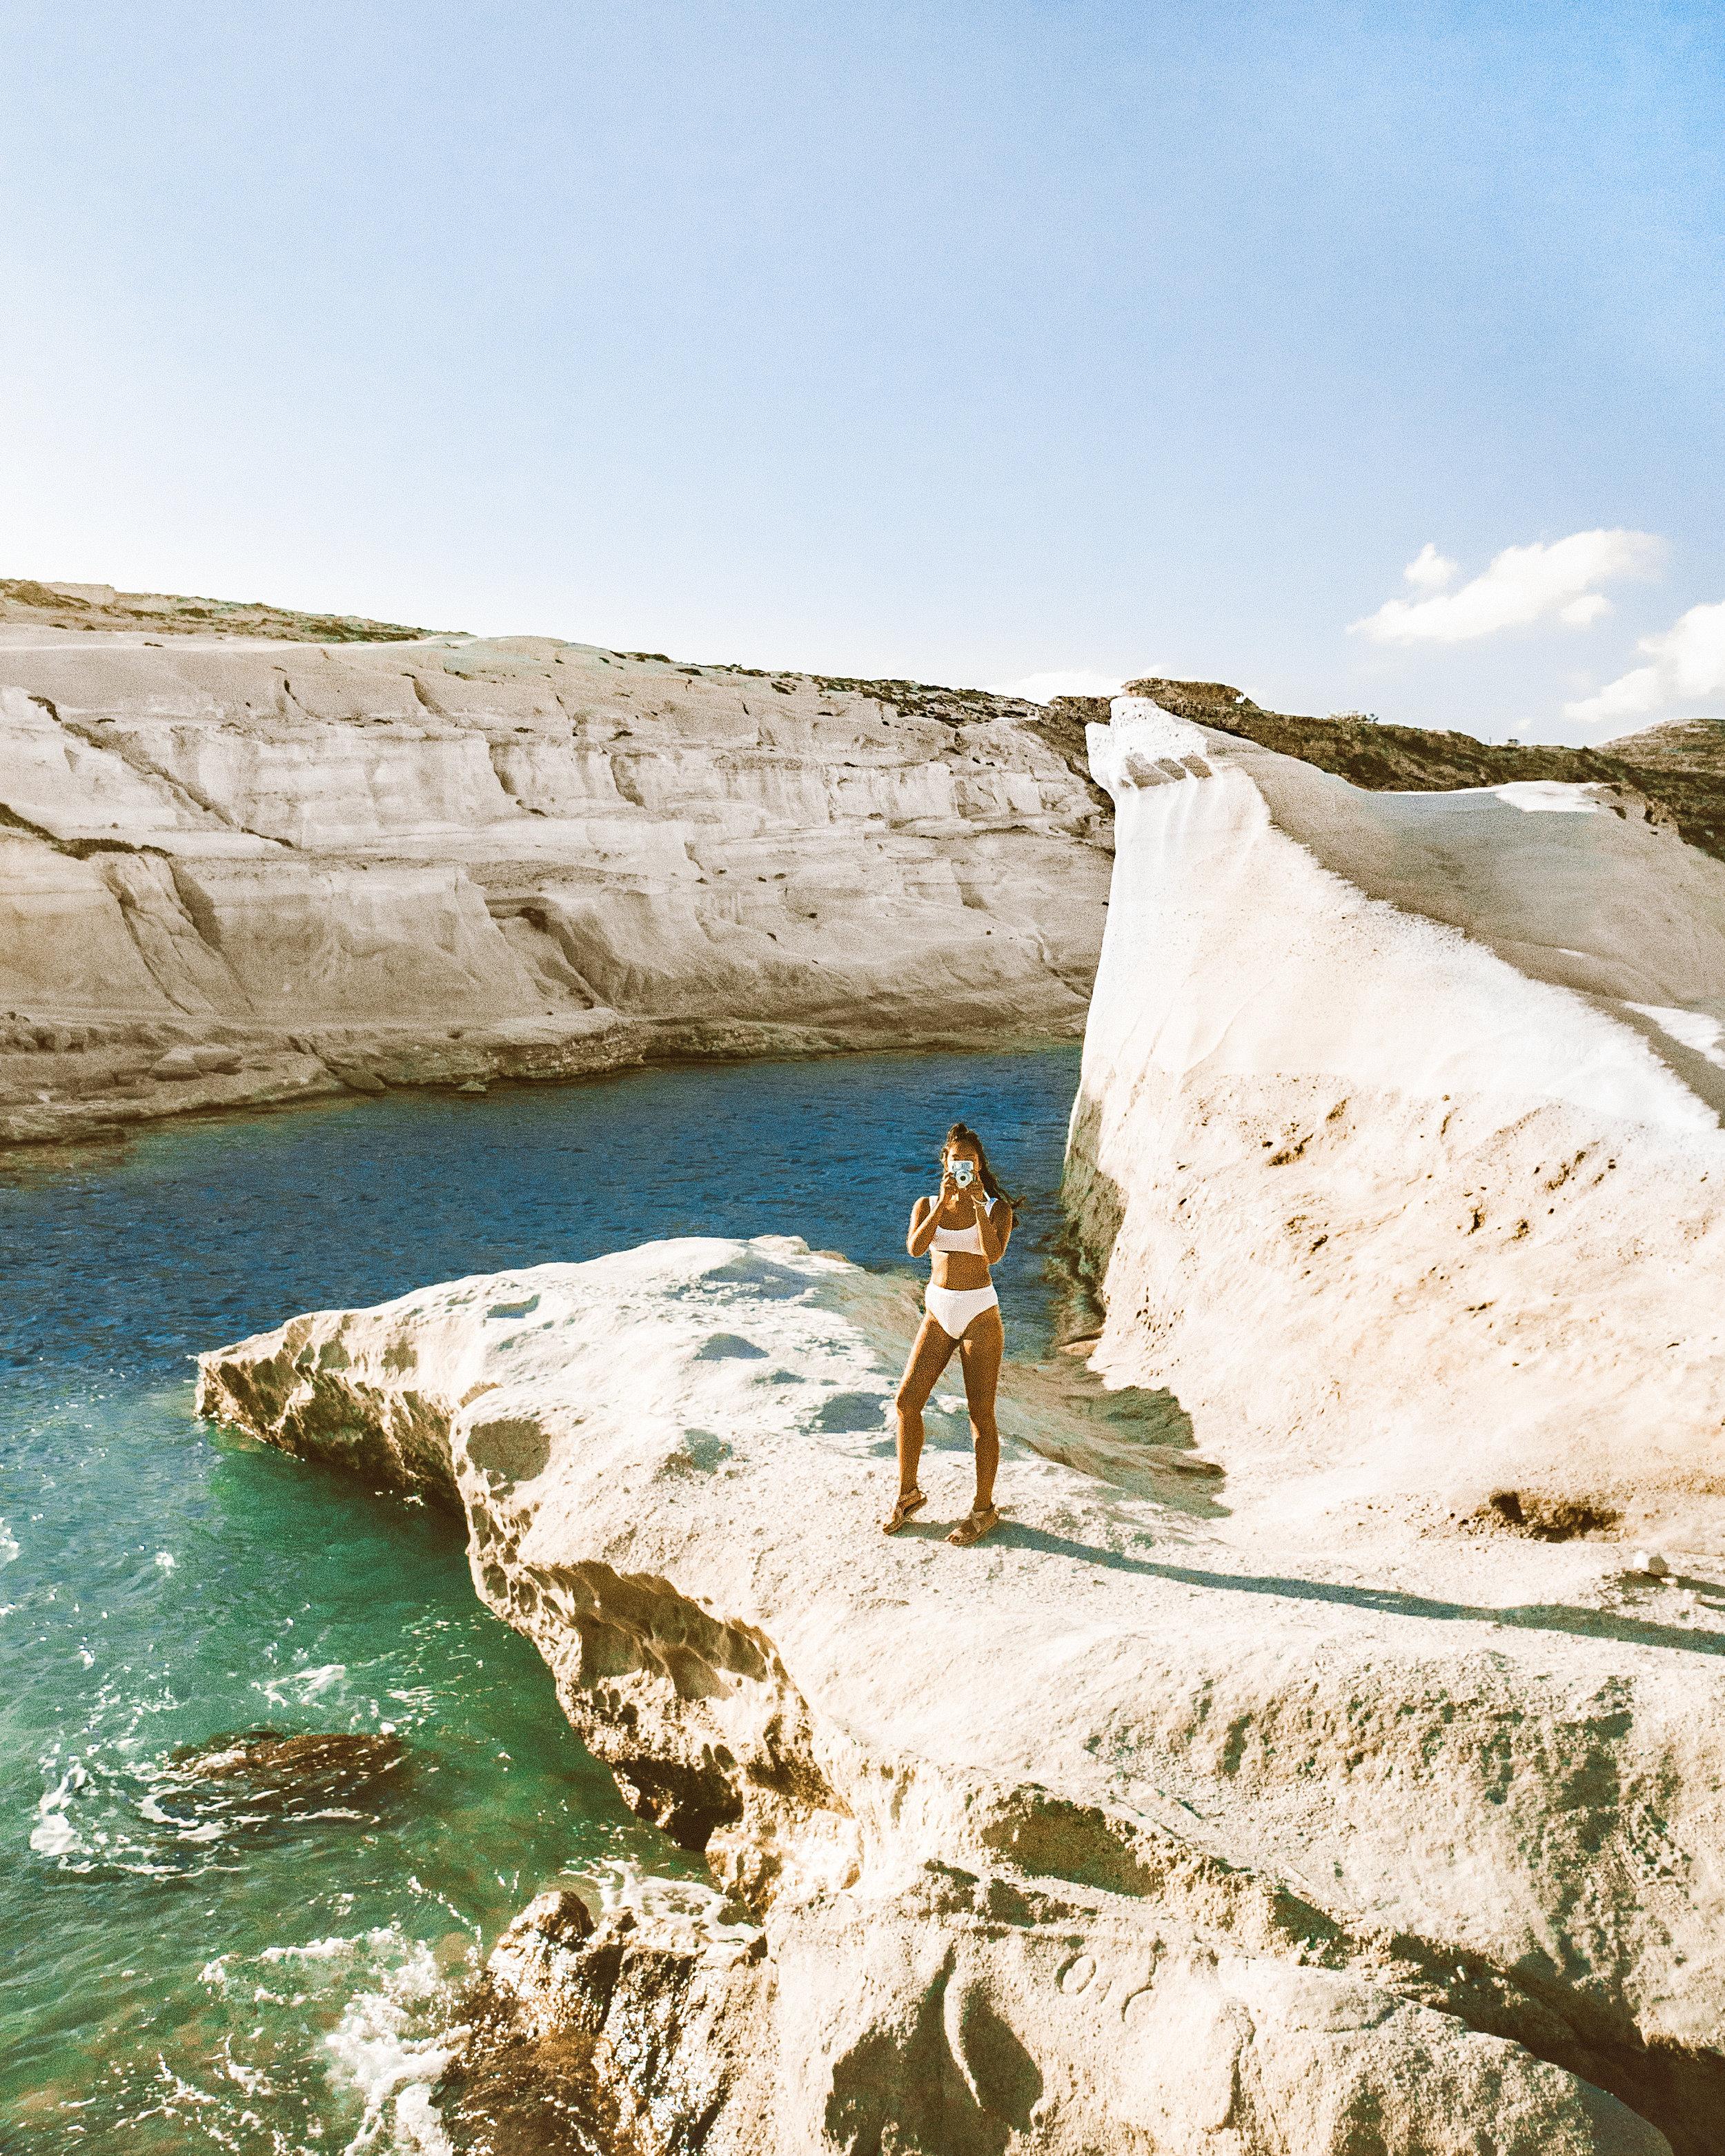 Mel in a white bikini standing on Sarakiniko Beach in Milos, Greece, taking a Polaroid photo at sunrise